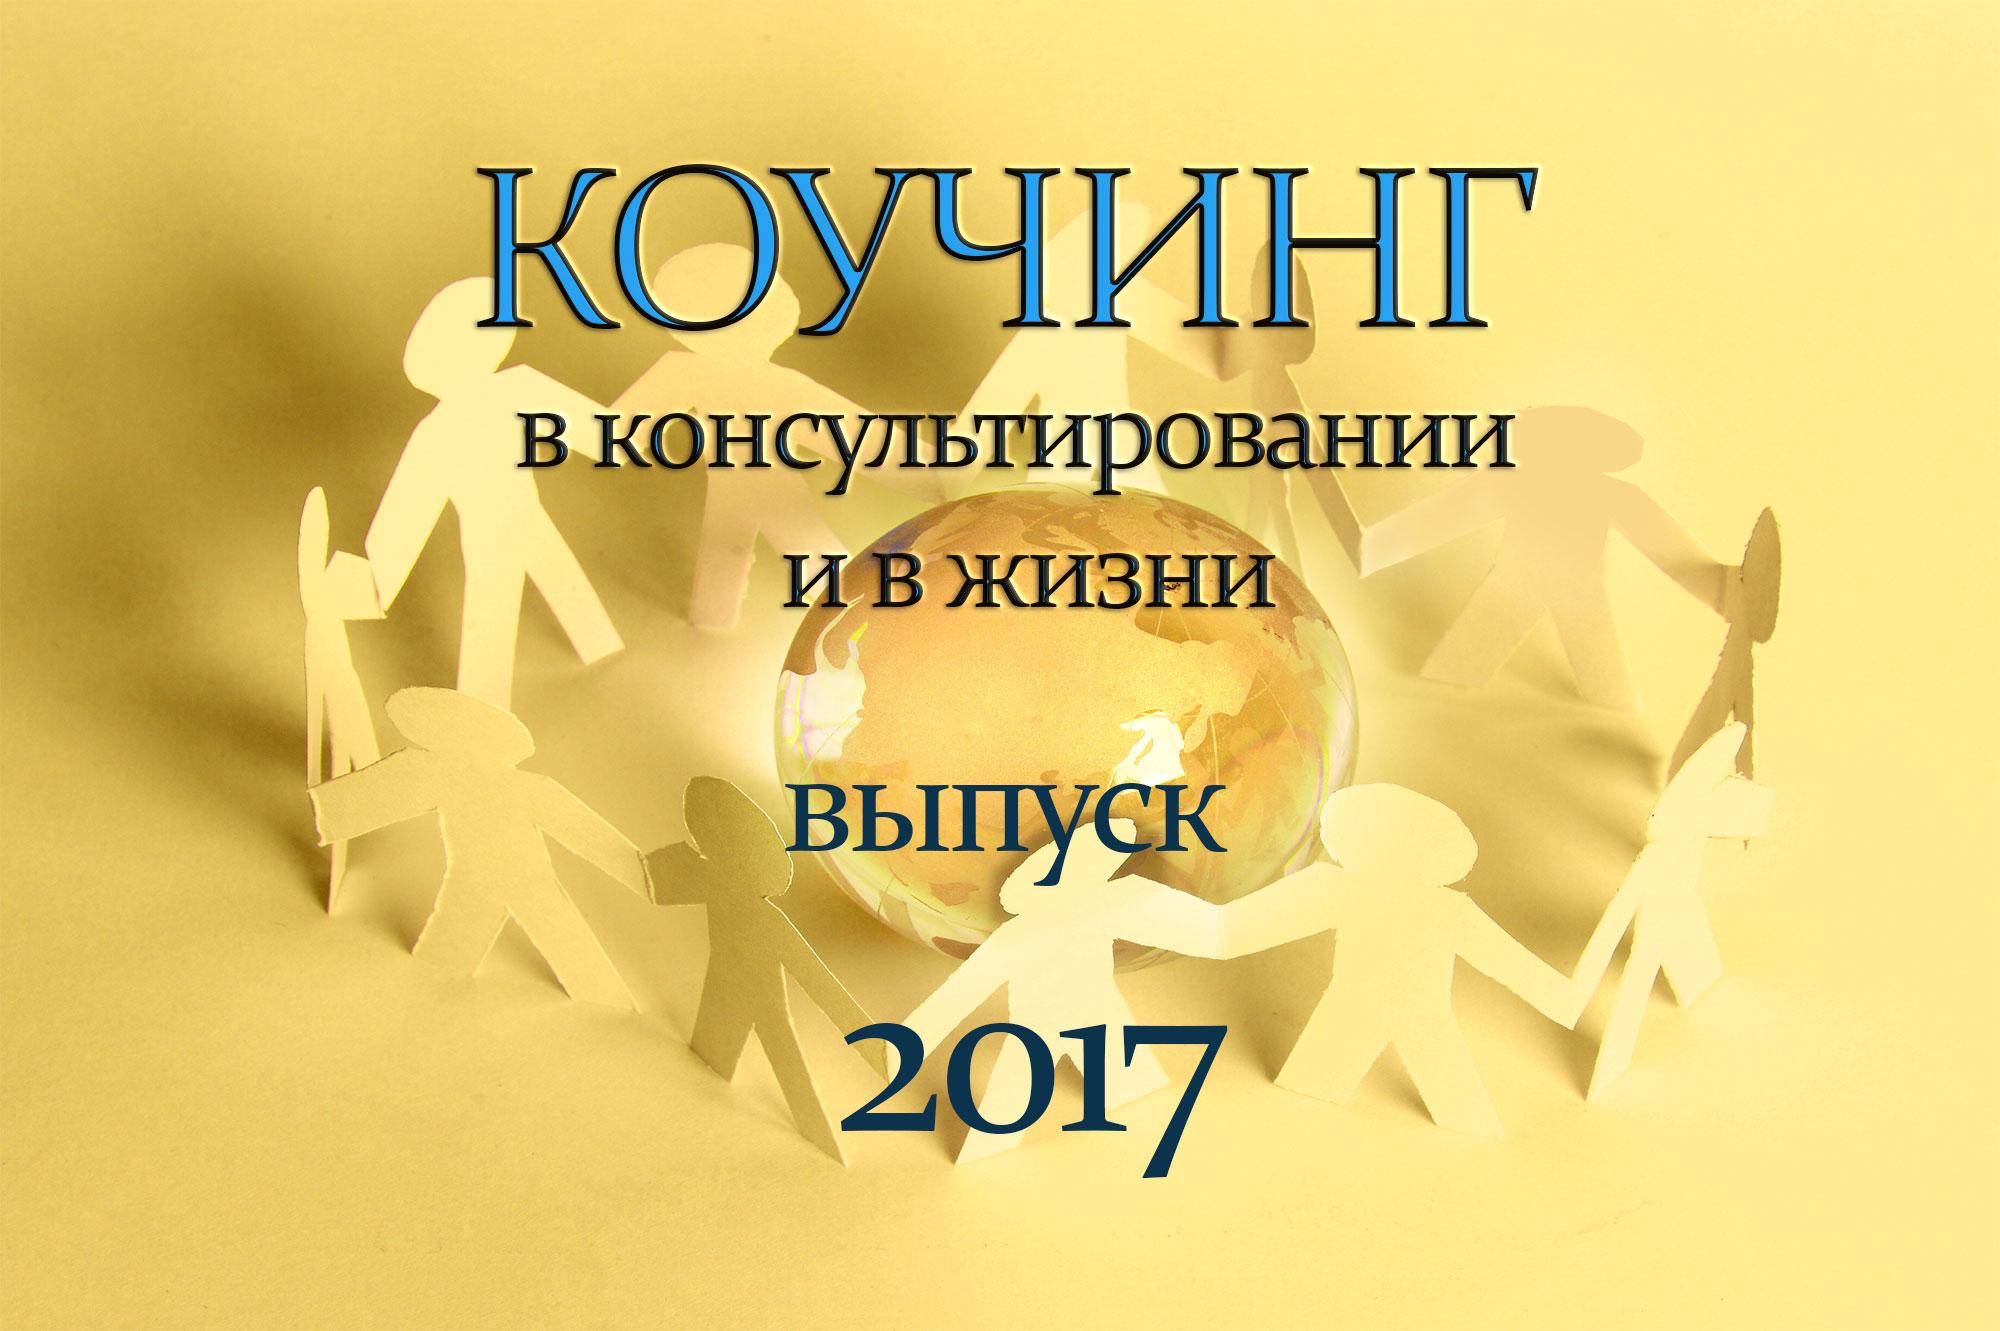 http://psyholog.biz/wp-content/uploads/2017/09/kouching2017.jpg